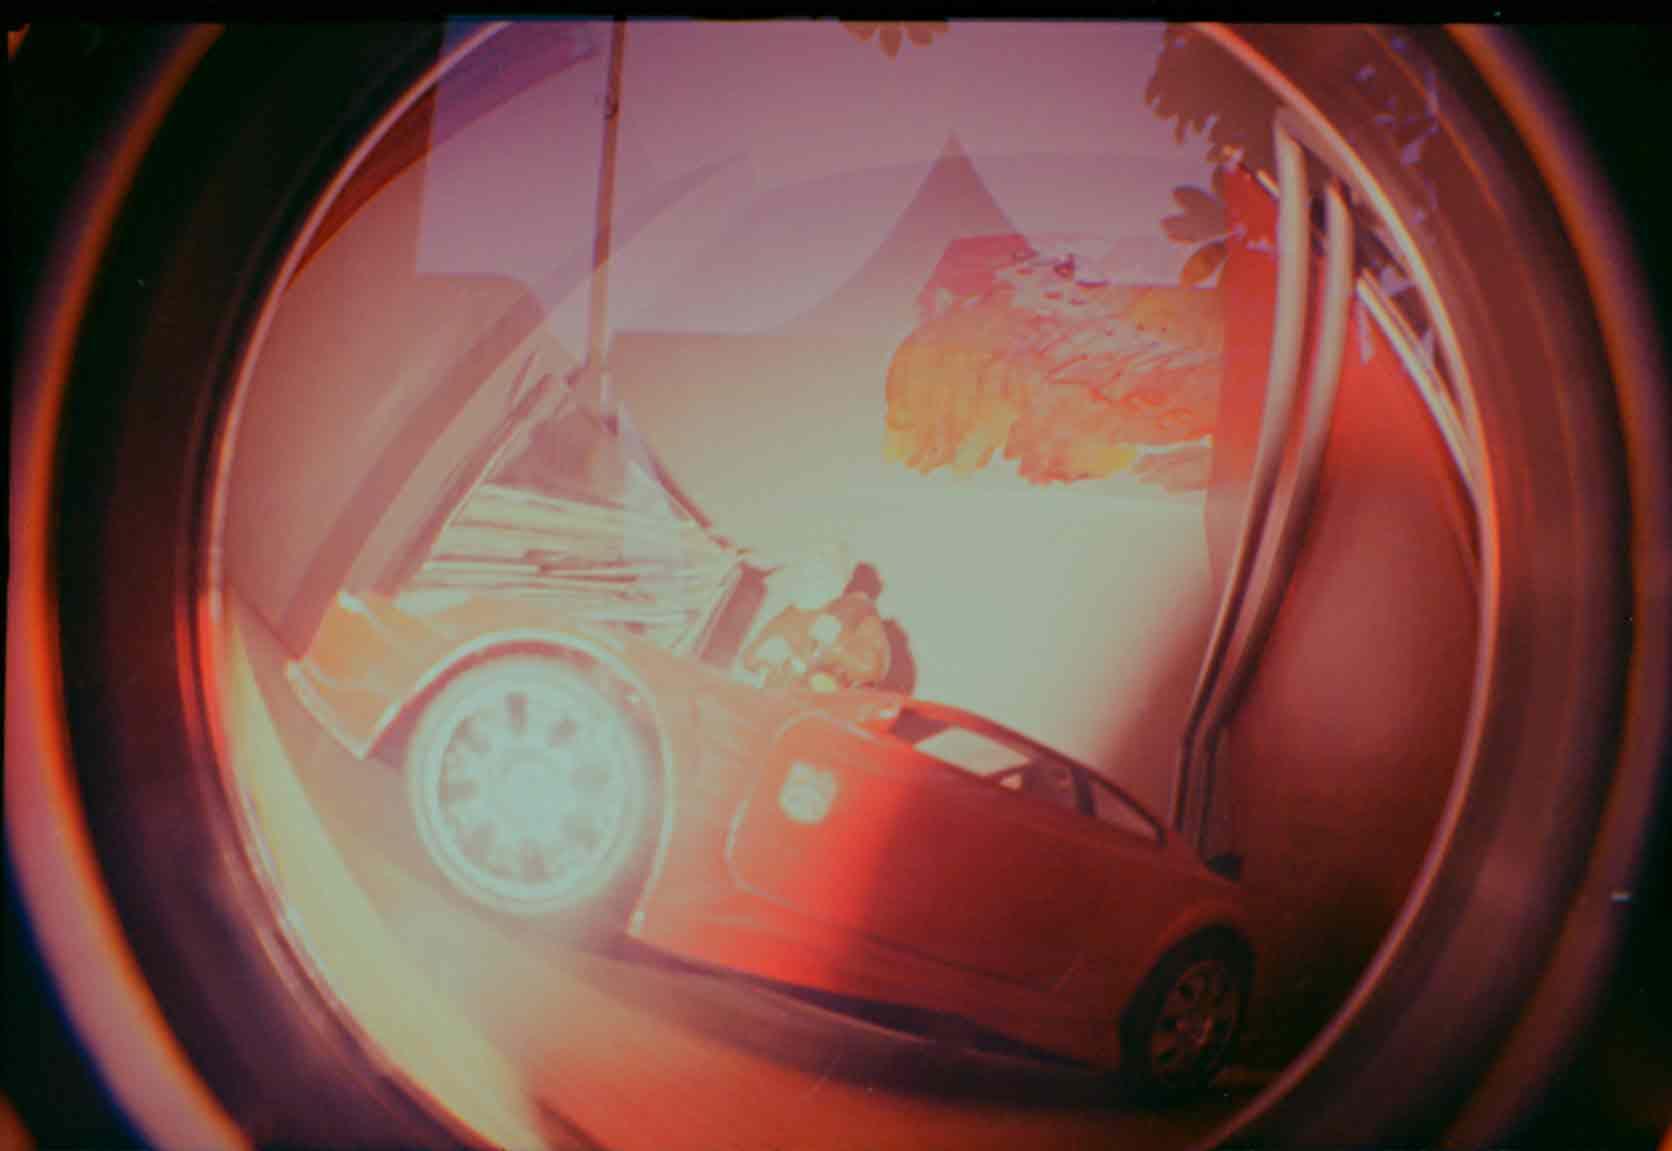 FilmSwap-fotografia-oldskull-05